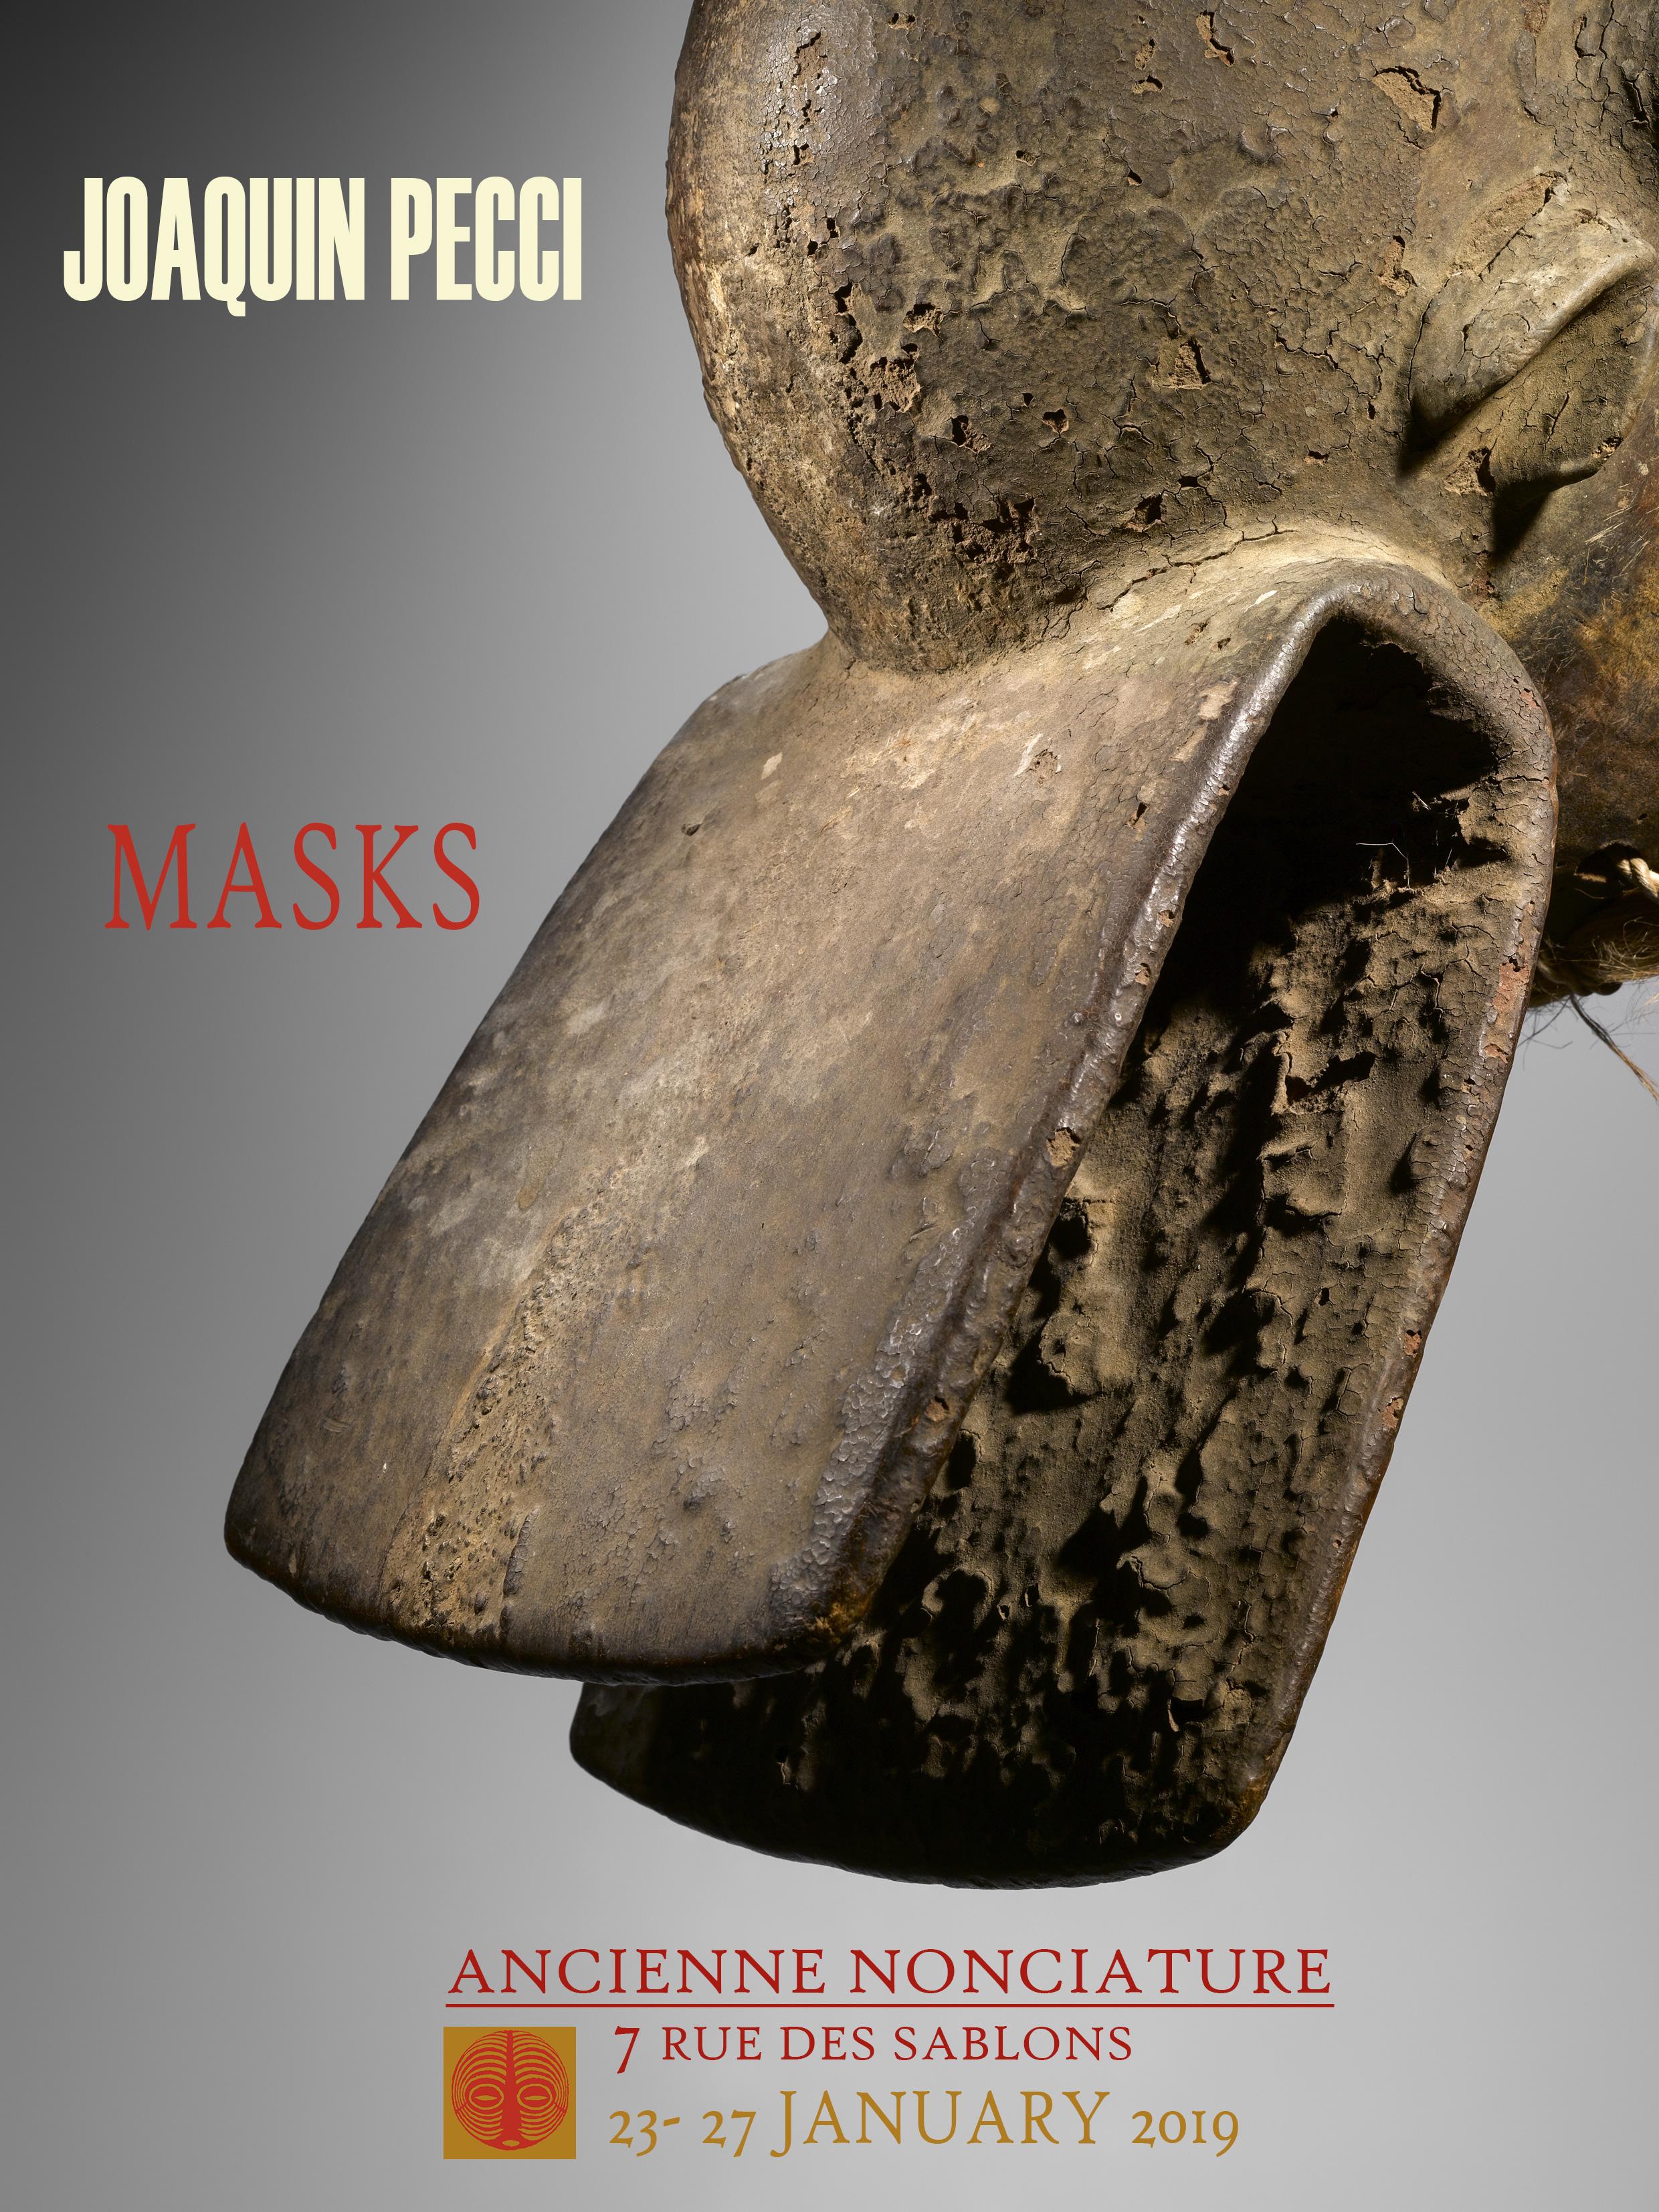 WinterBruneaf-Invitation2019-PECCI-masks